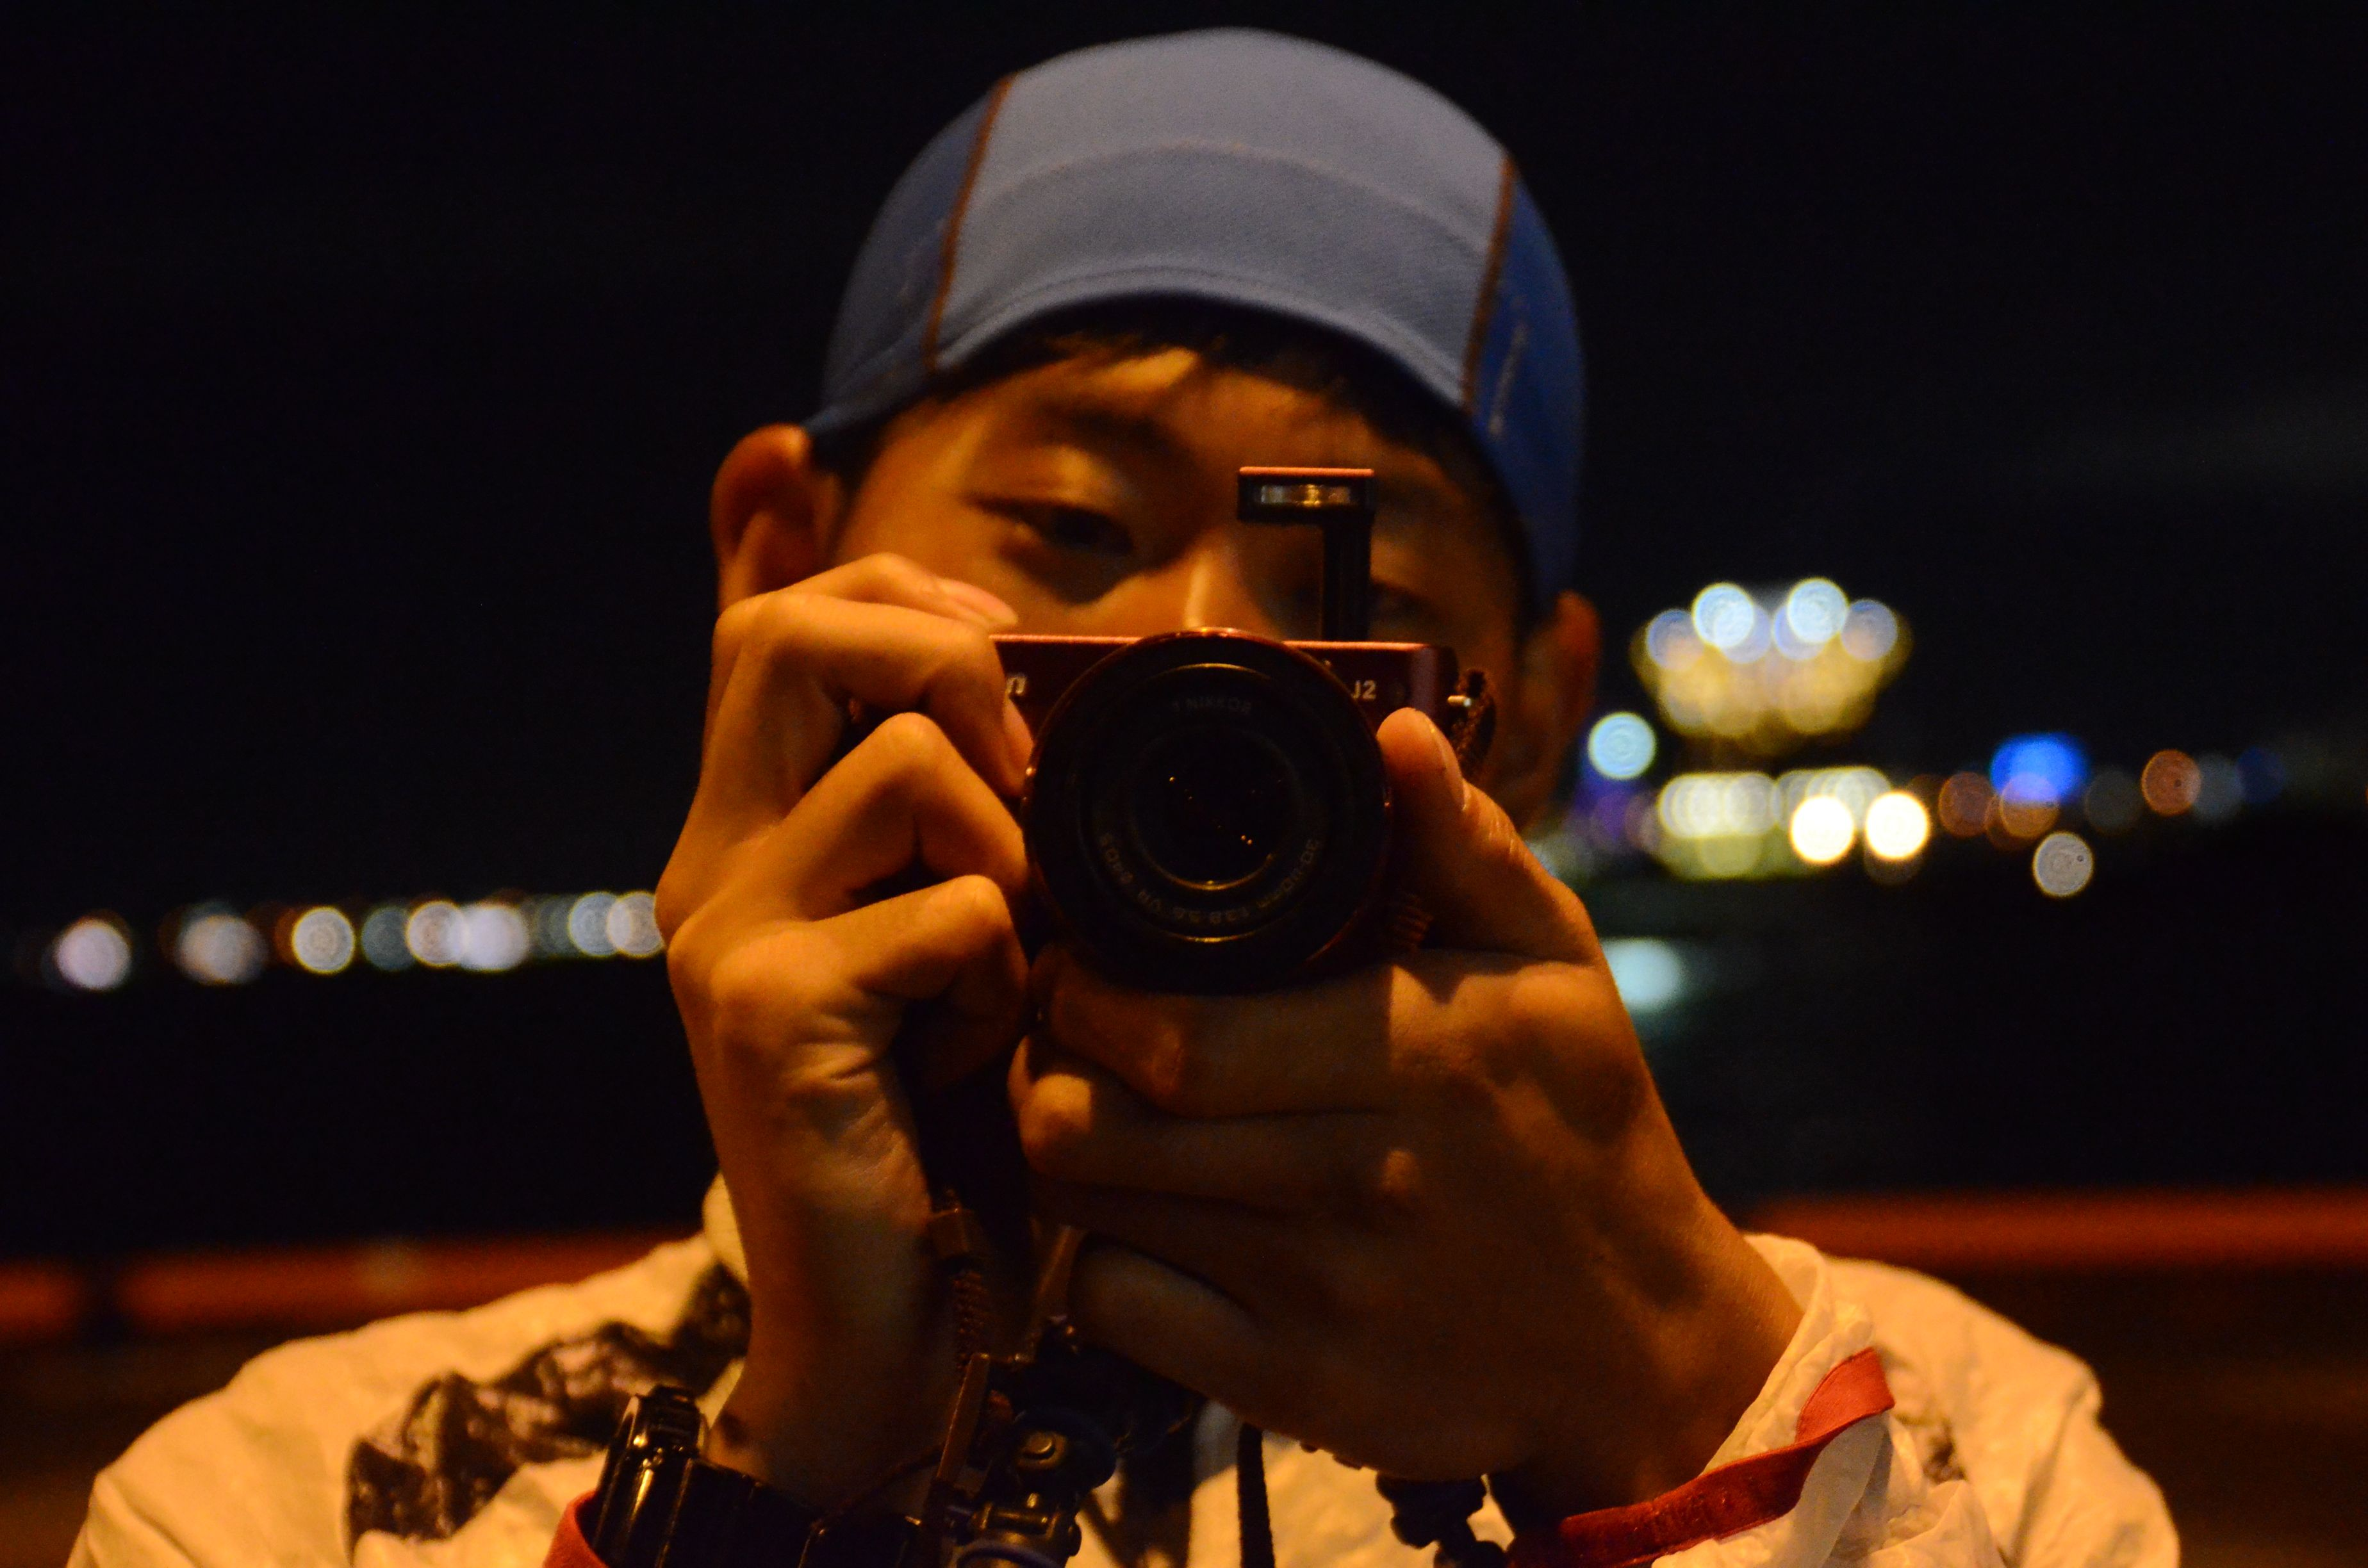 DSC_3879.jpg